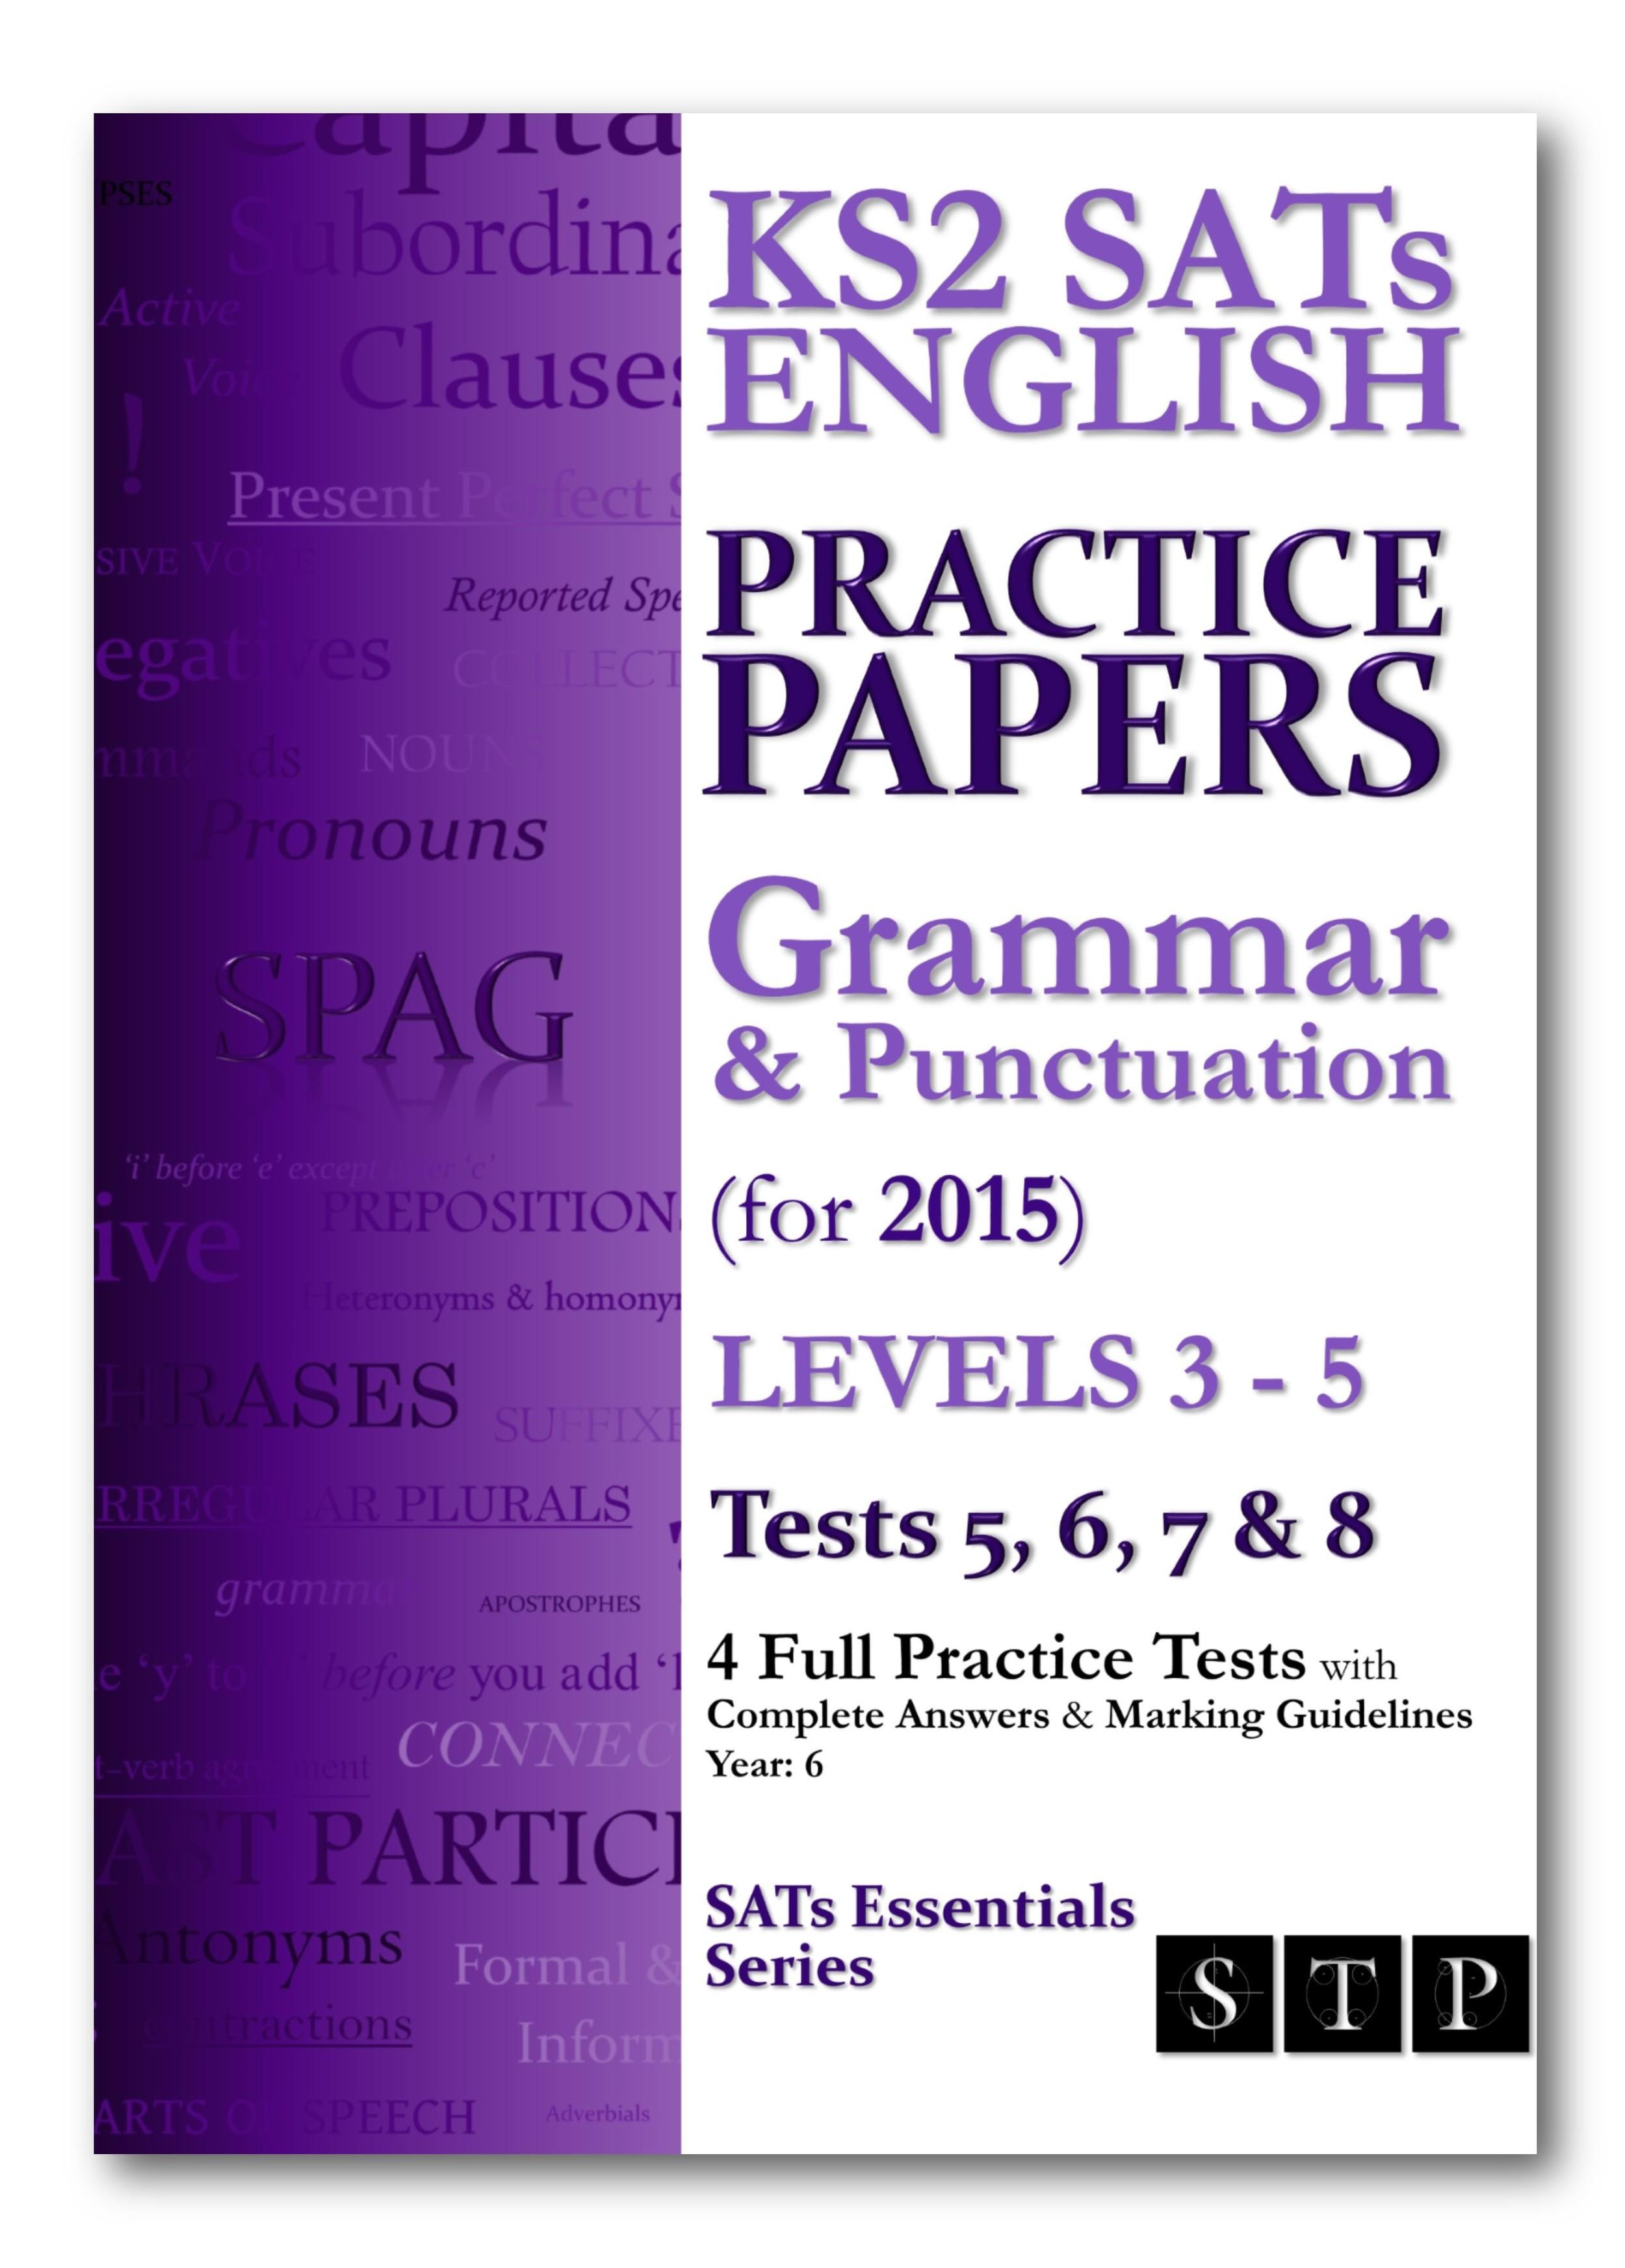 KS2 SATS Grammar & Punctuation Practice Papers Levels 3-5 Tests 5, 6, 7 & 8